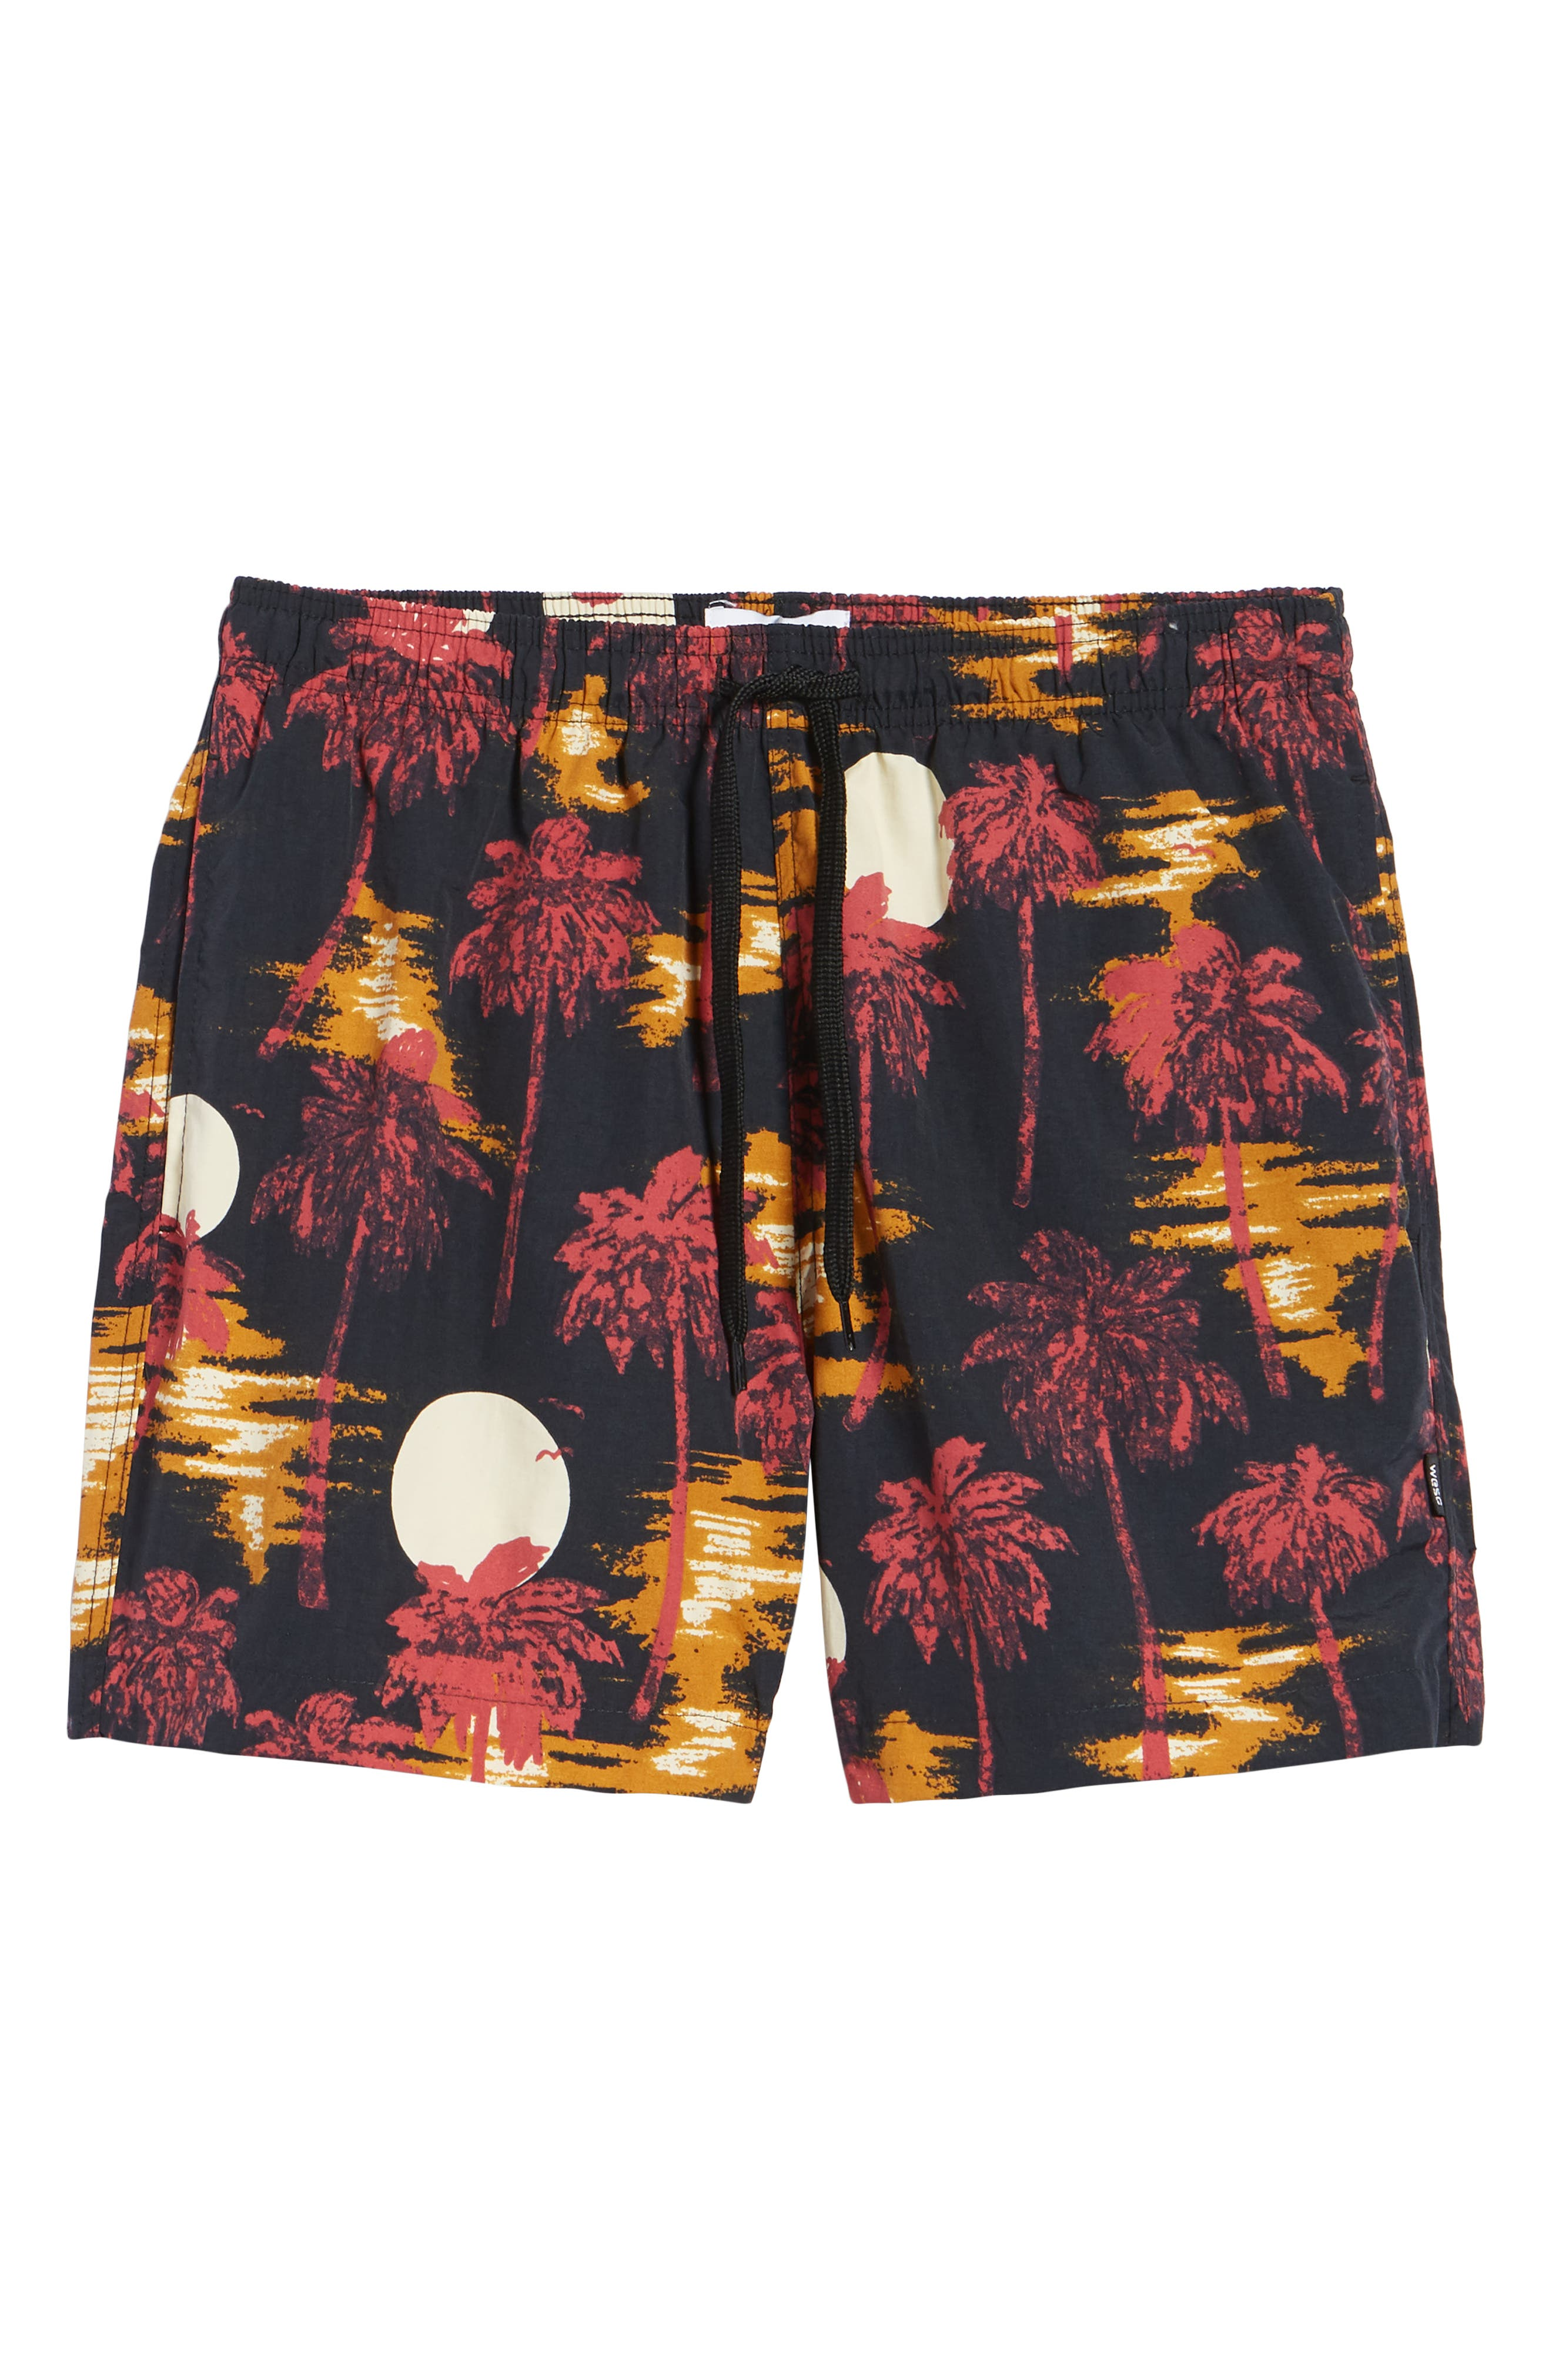 Zack Hawaii Swim Trunks,                             Alternate thumbnail 6, color,                             001